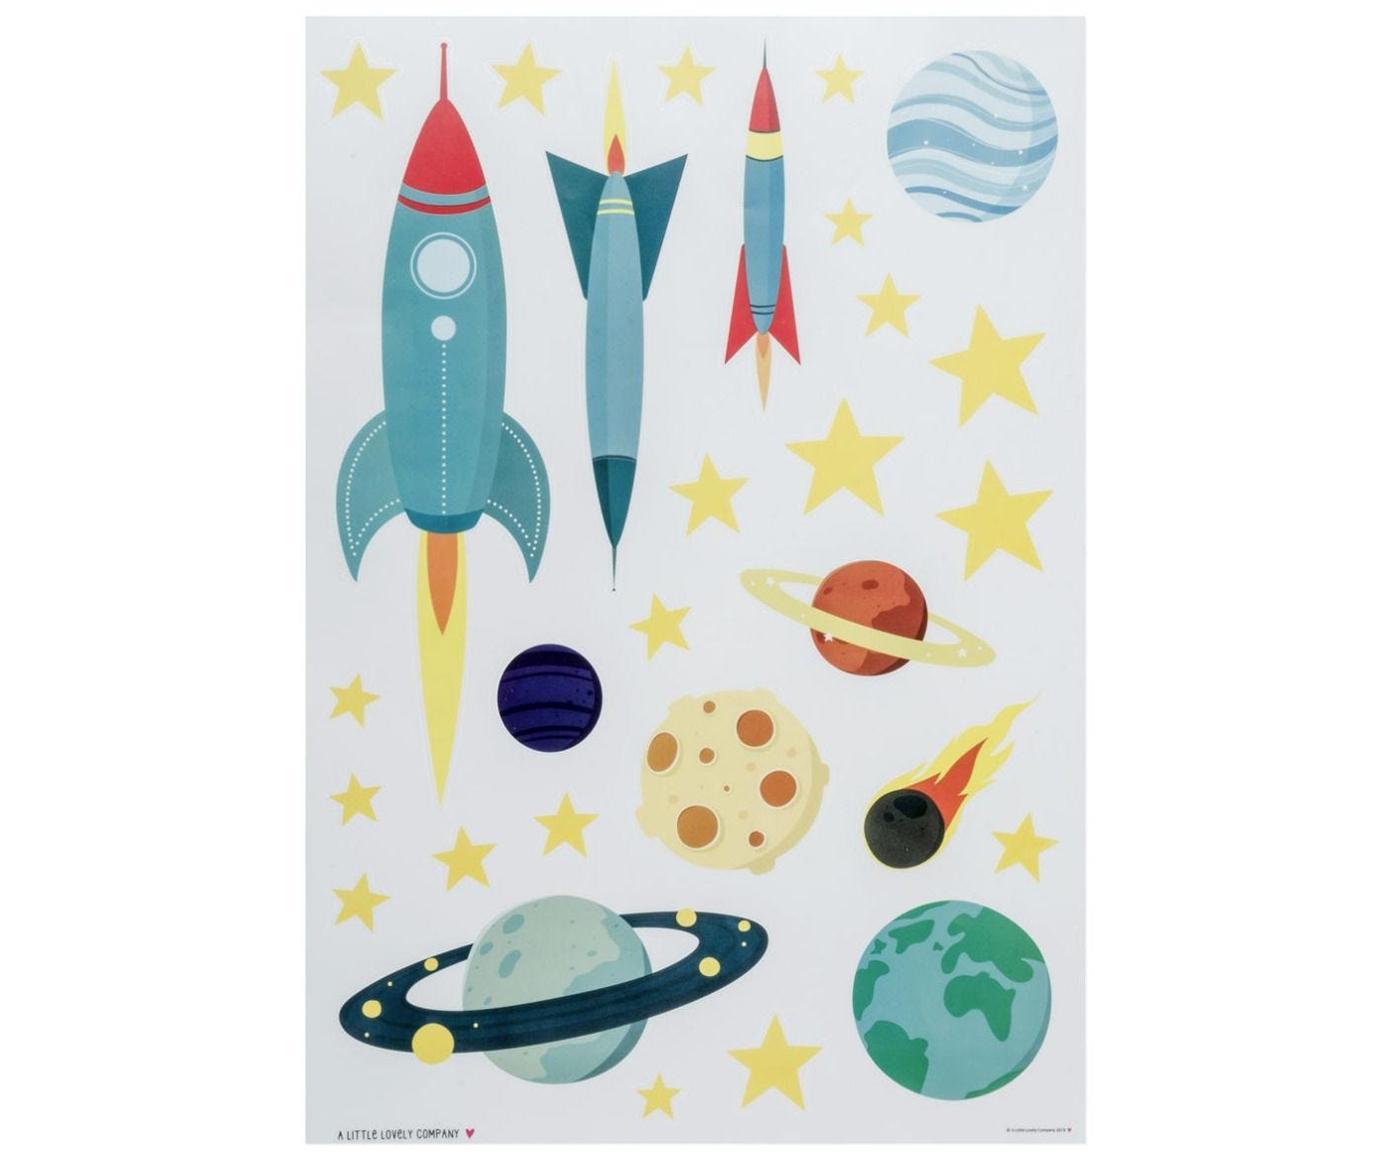 Wandaufkleber-Set Space, 29-tlg. , Kunststoff, Mehrfarbig, 35 x 50 cm